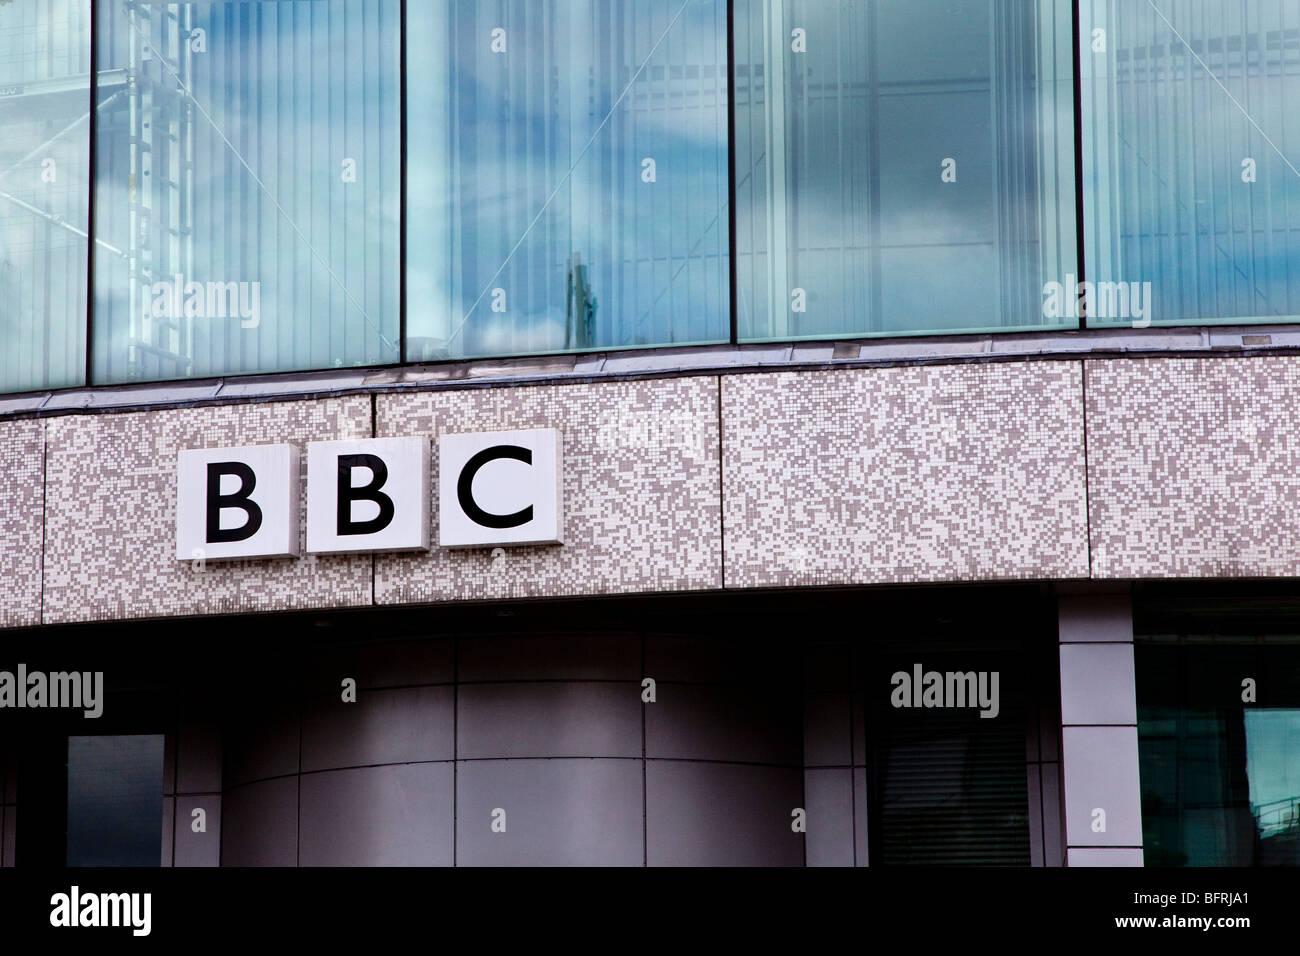 BBC Television center, Wood Lane, London - Stock Image